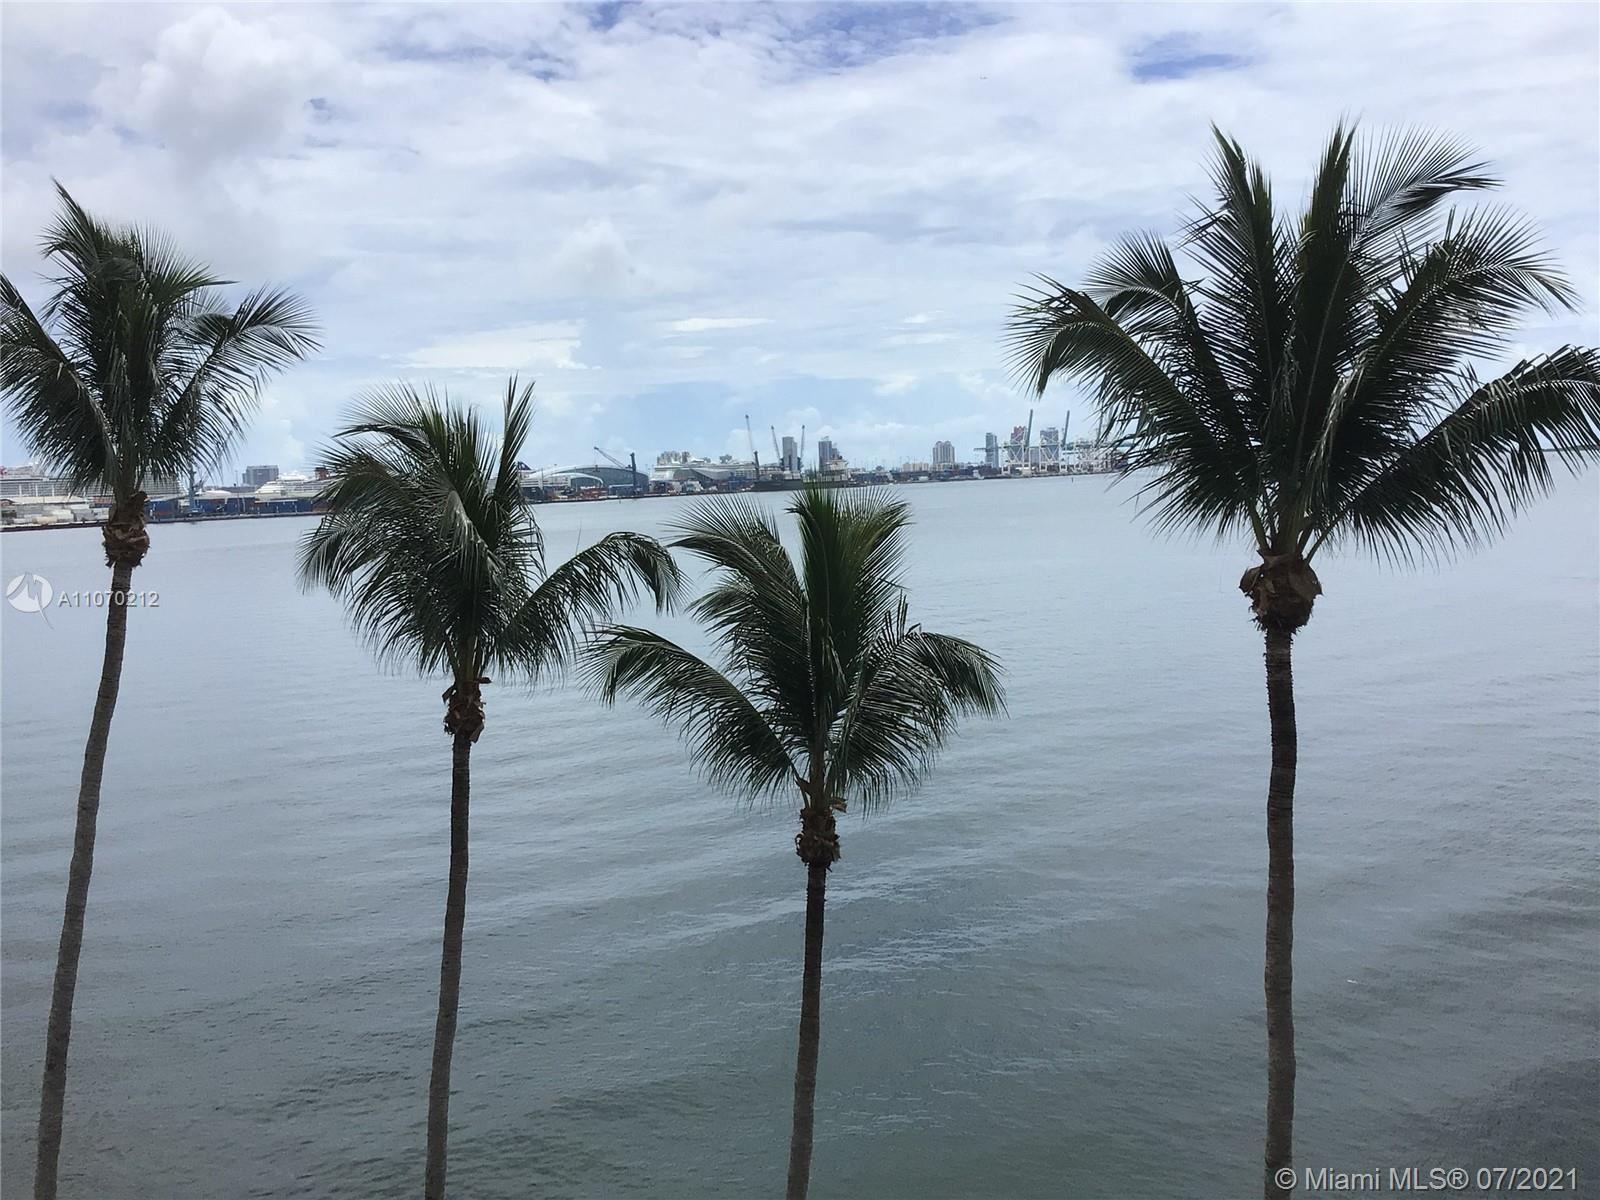 540 Brickell Key Dr #523, Miami, FL 33131 - #: A11070212